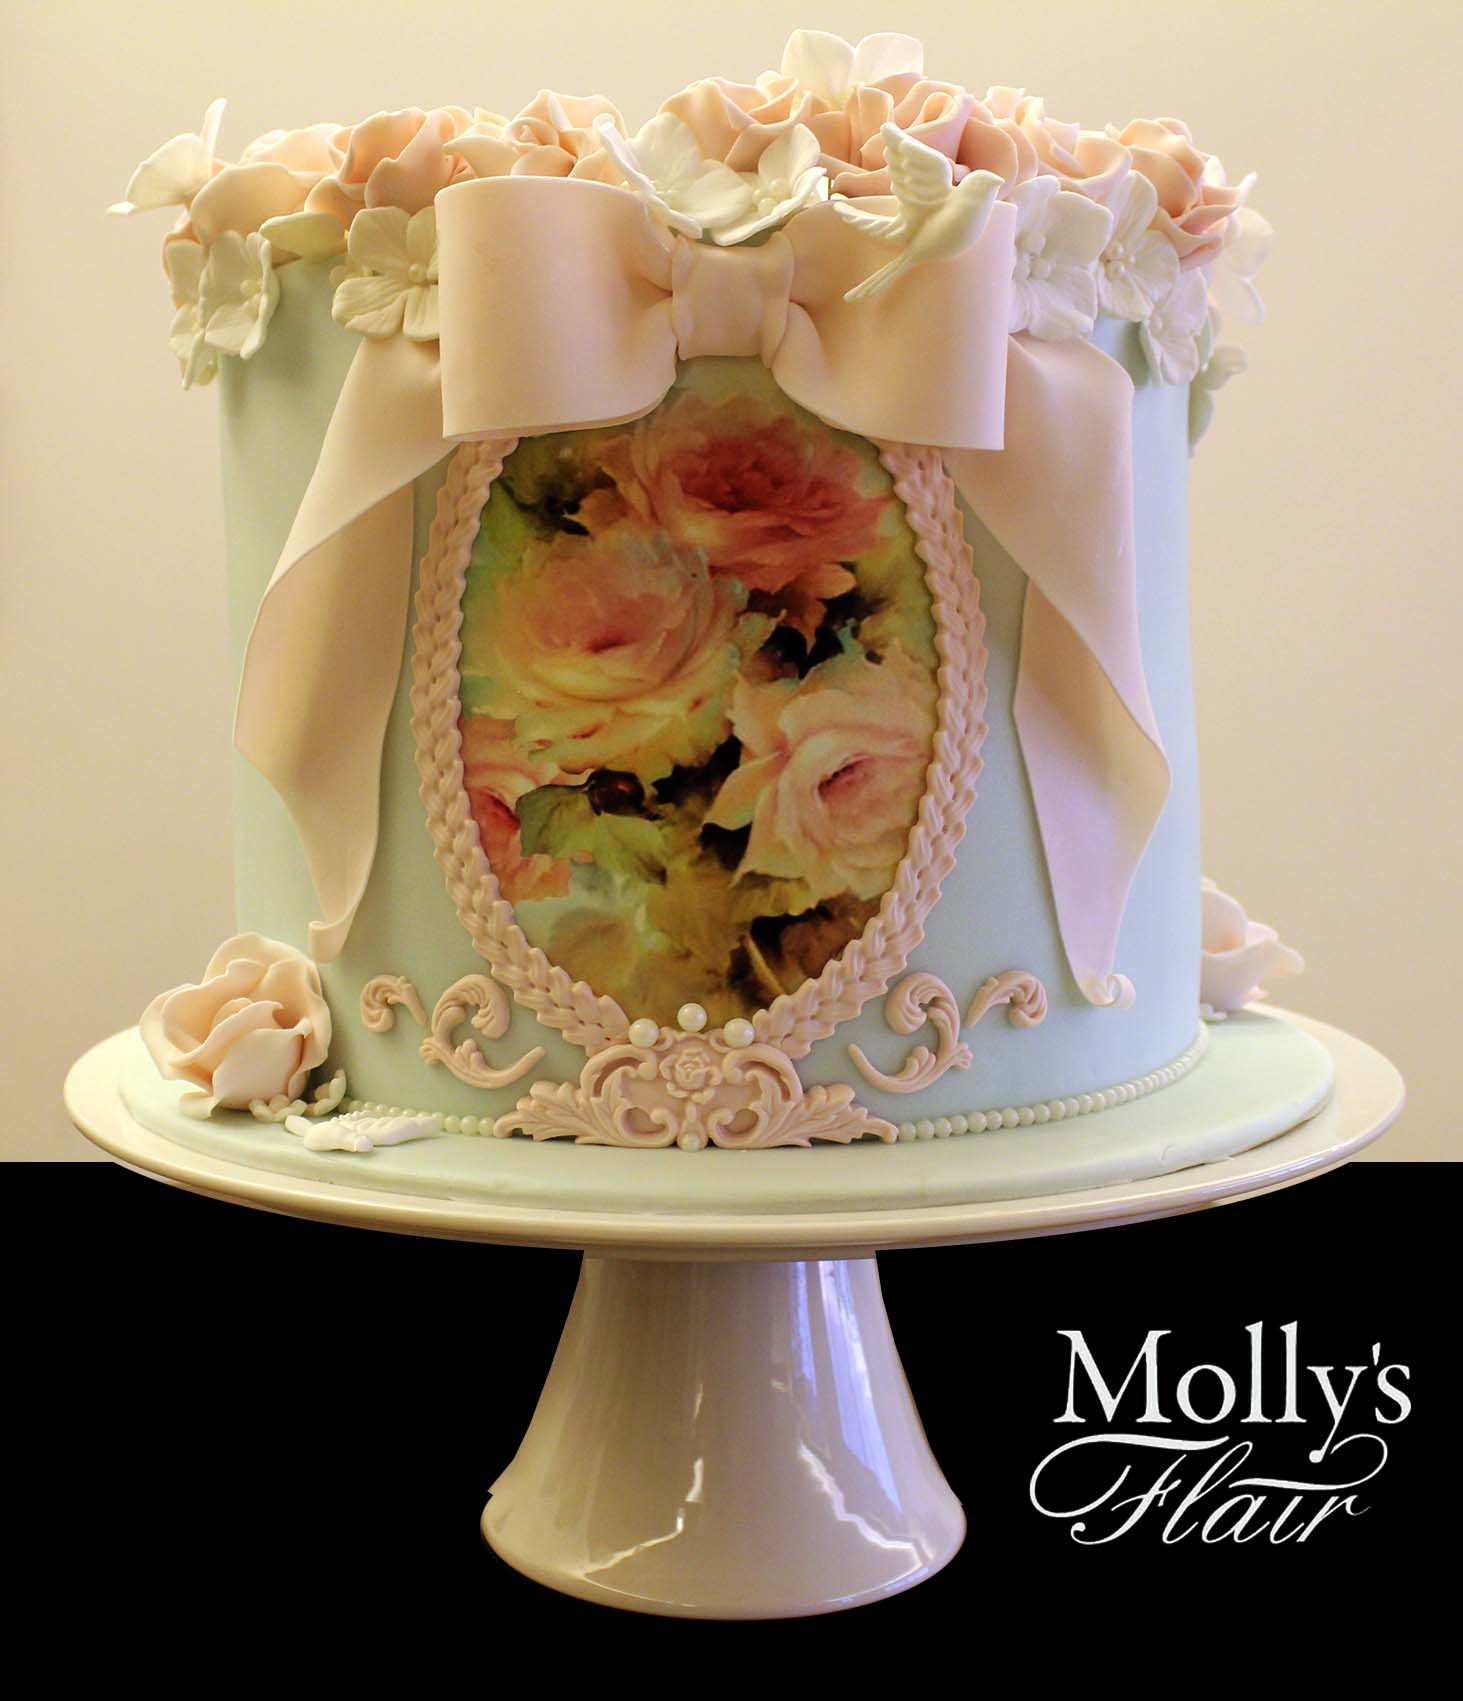 Hanpainted floral cake